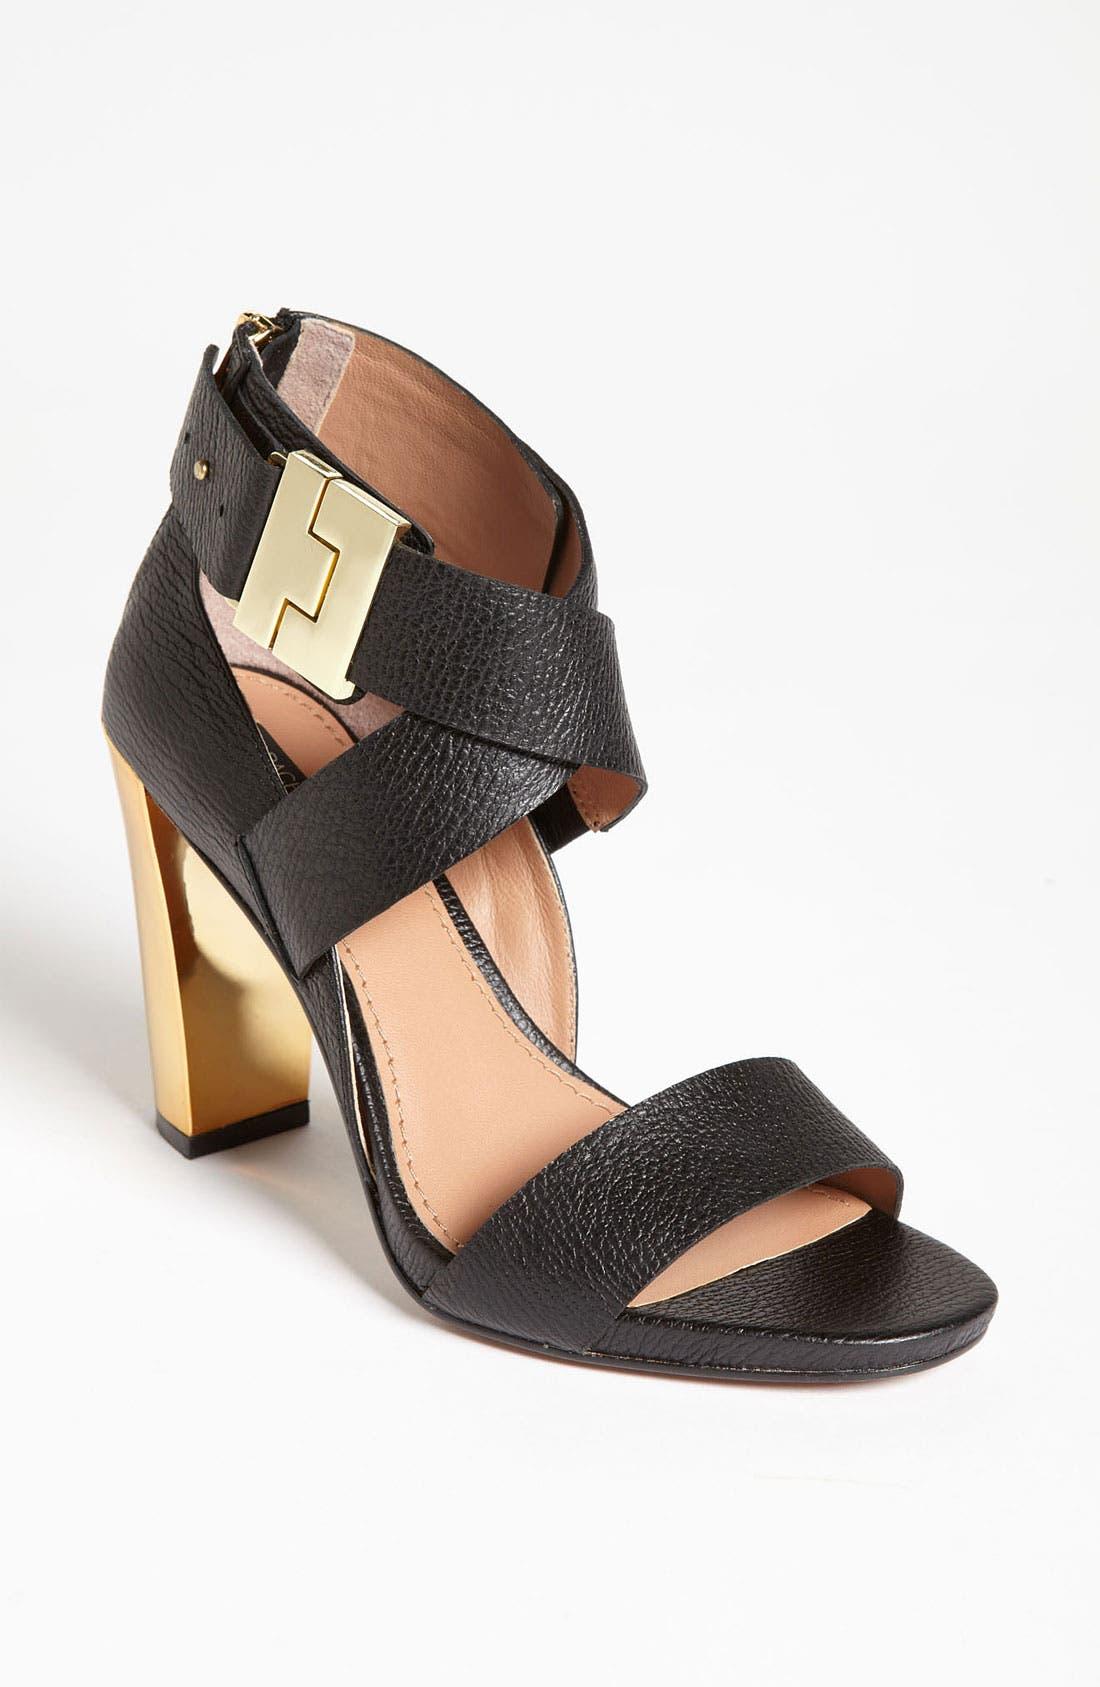 Alternate Image 1 Selected - Rachel Zoe 'Brooklyn' Sandal